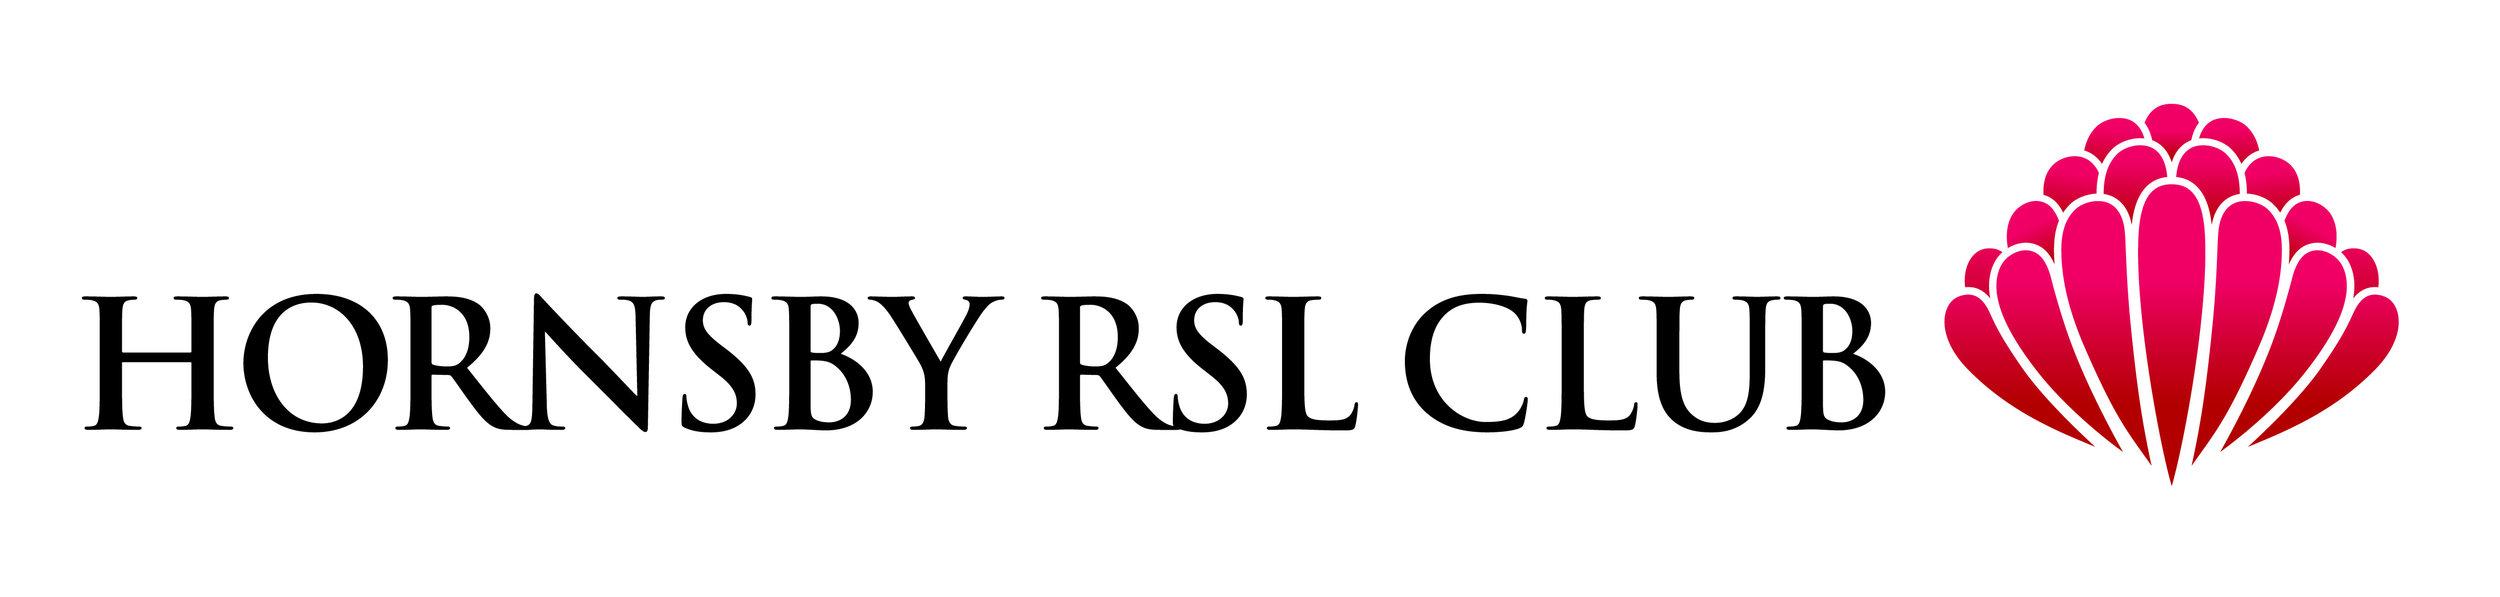 Hornsby RSL Club.jpg